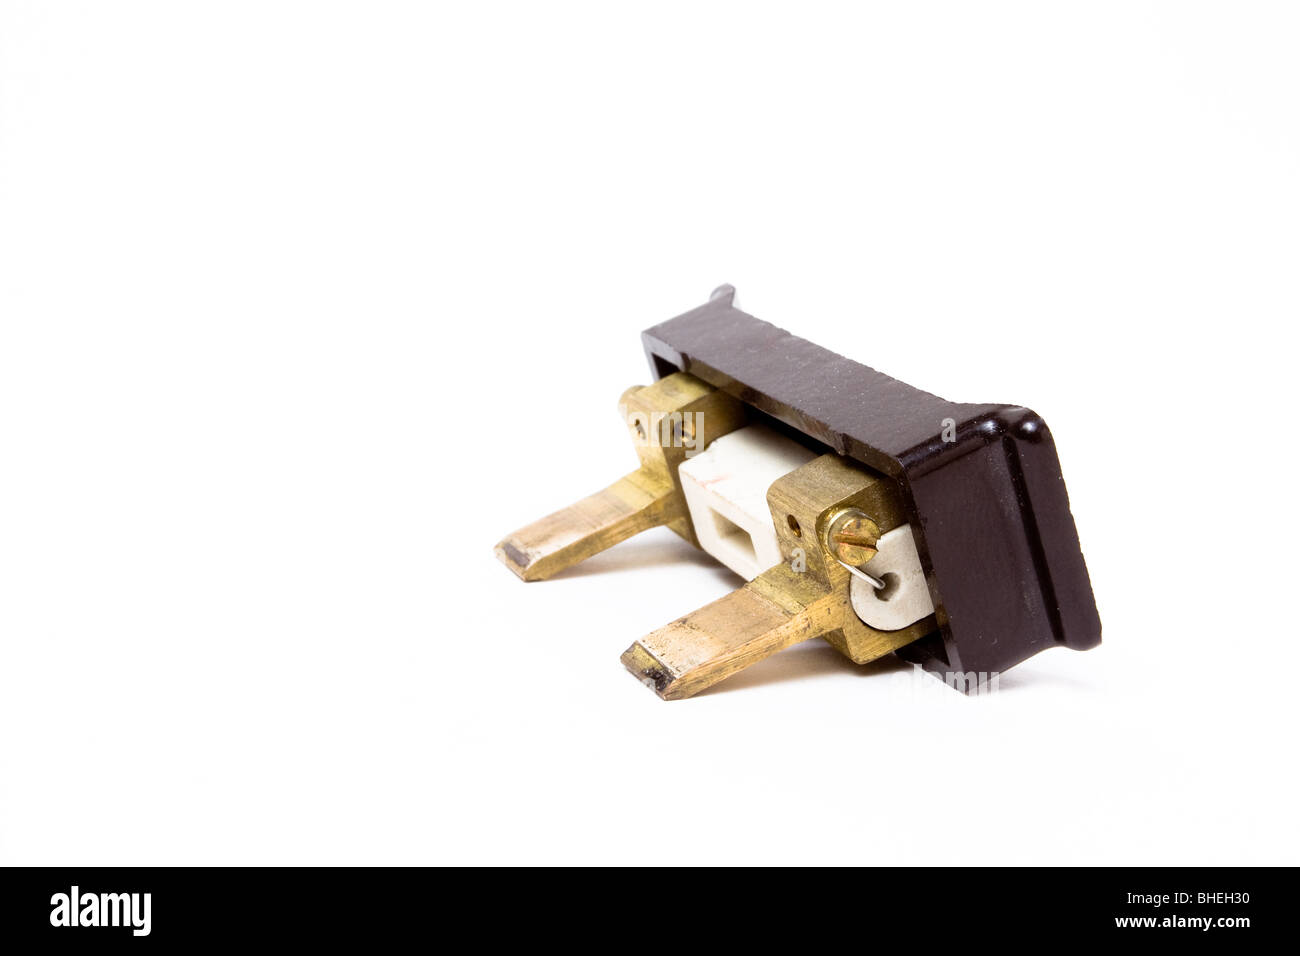 Old Fashioned Electric Razor Plug